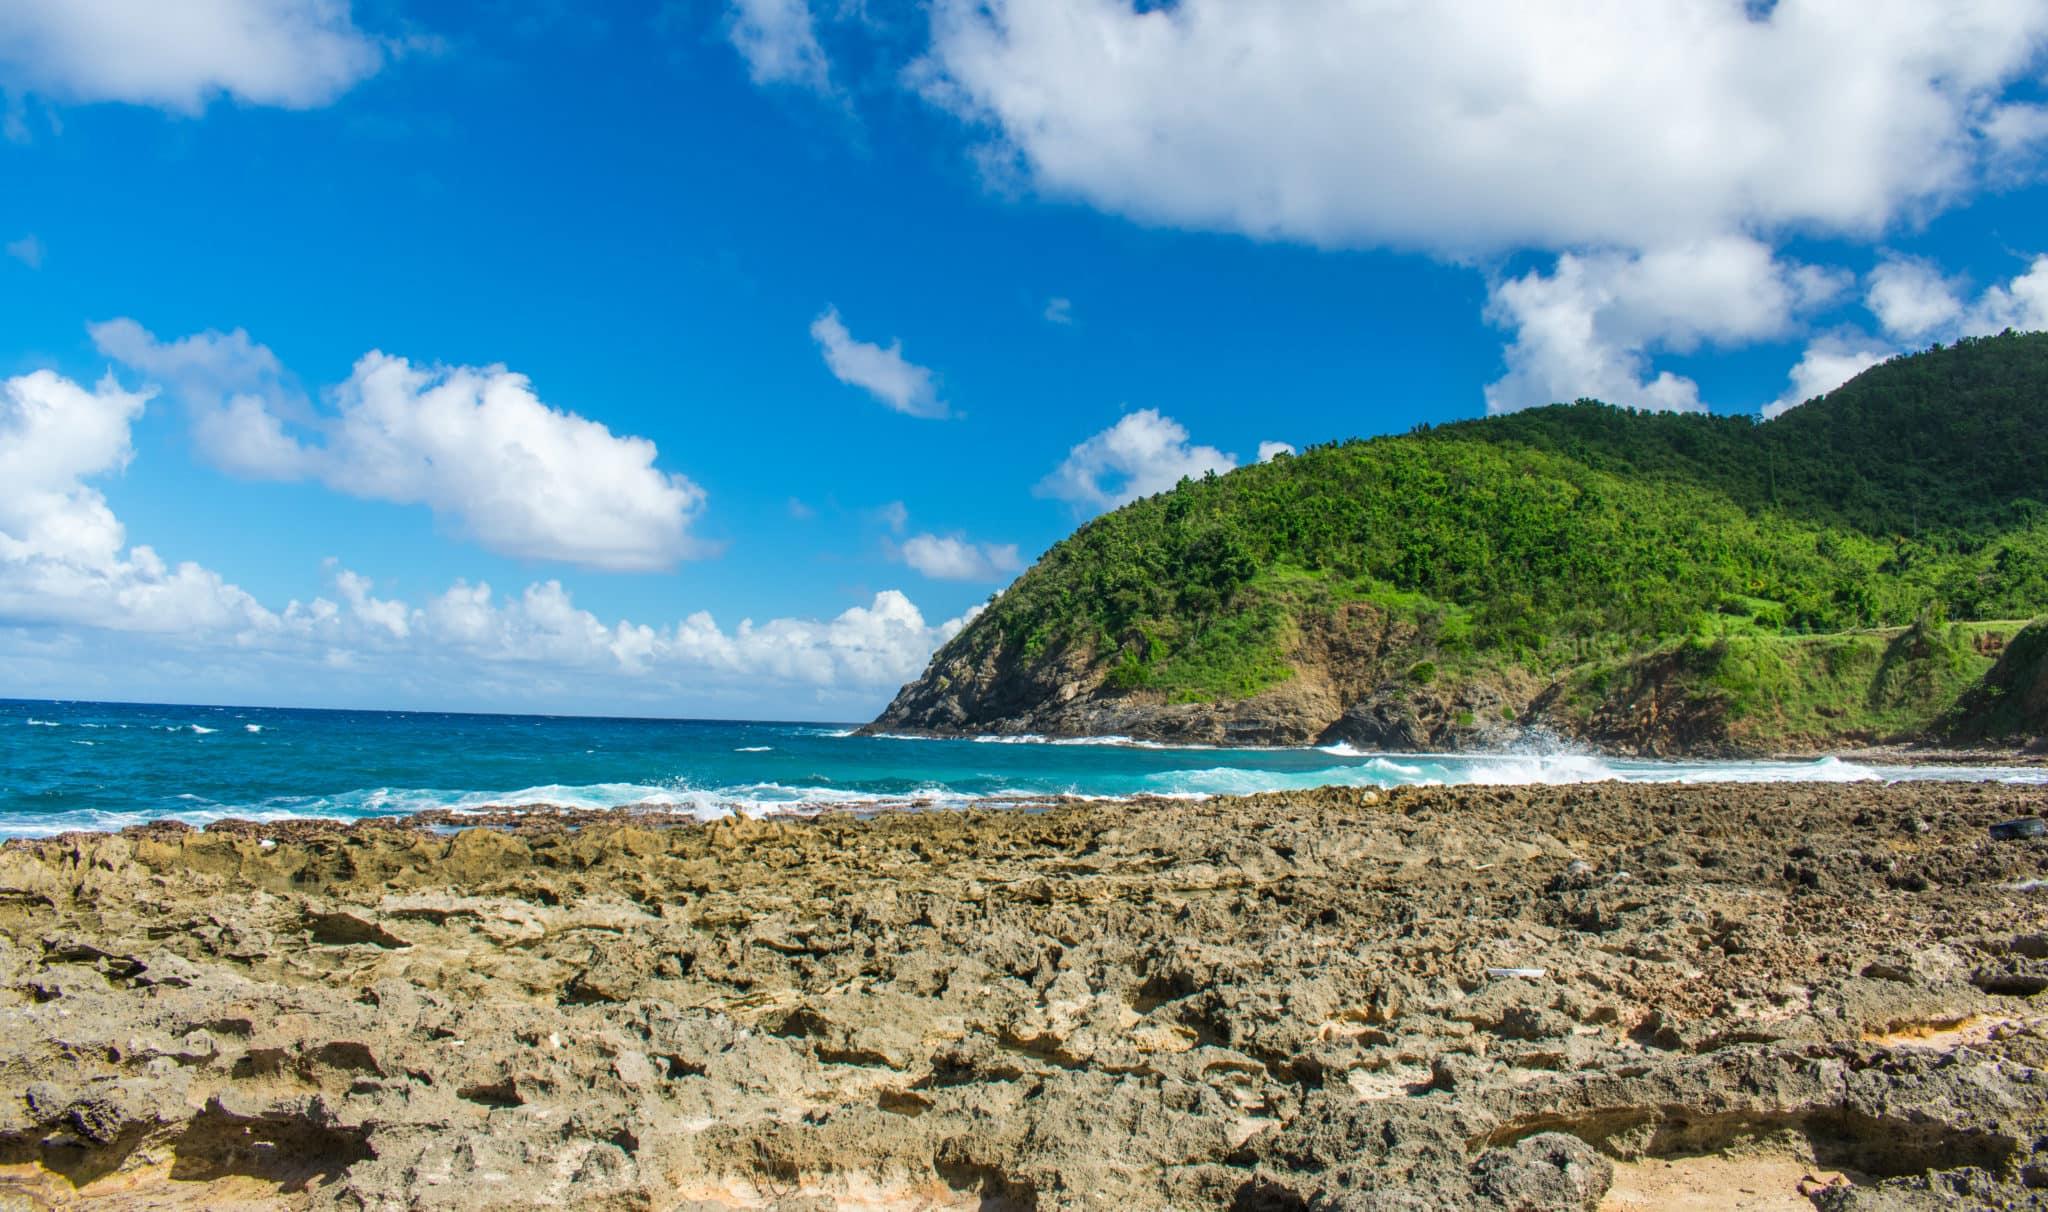 Wild, Wonderful Hams Bay, St. Croix: Uncommon Attraction